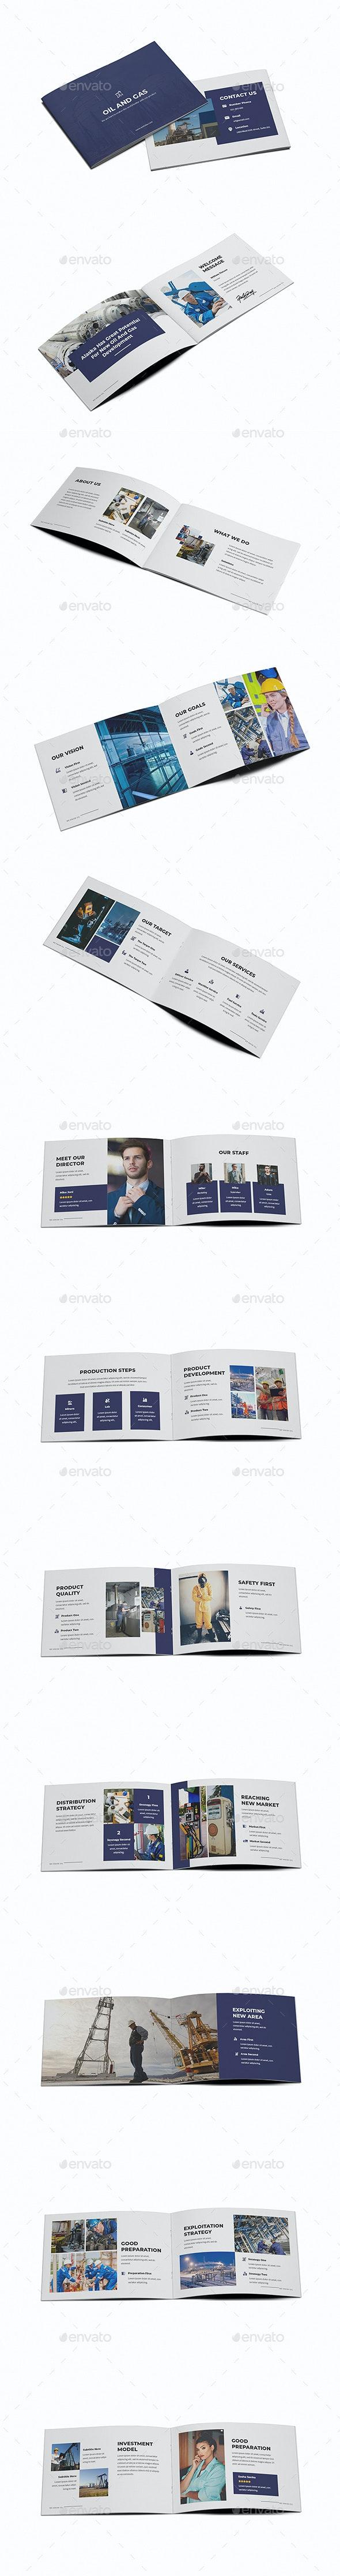 Oil & Gas A5 Brochure Template - Brochures Print Templates